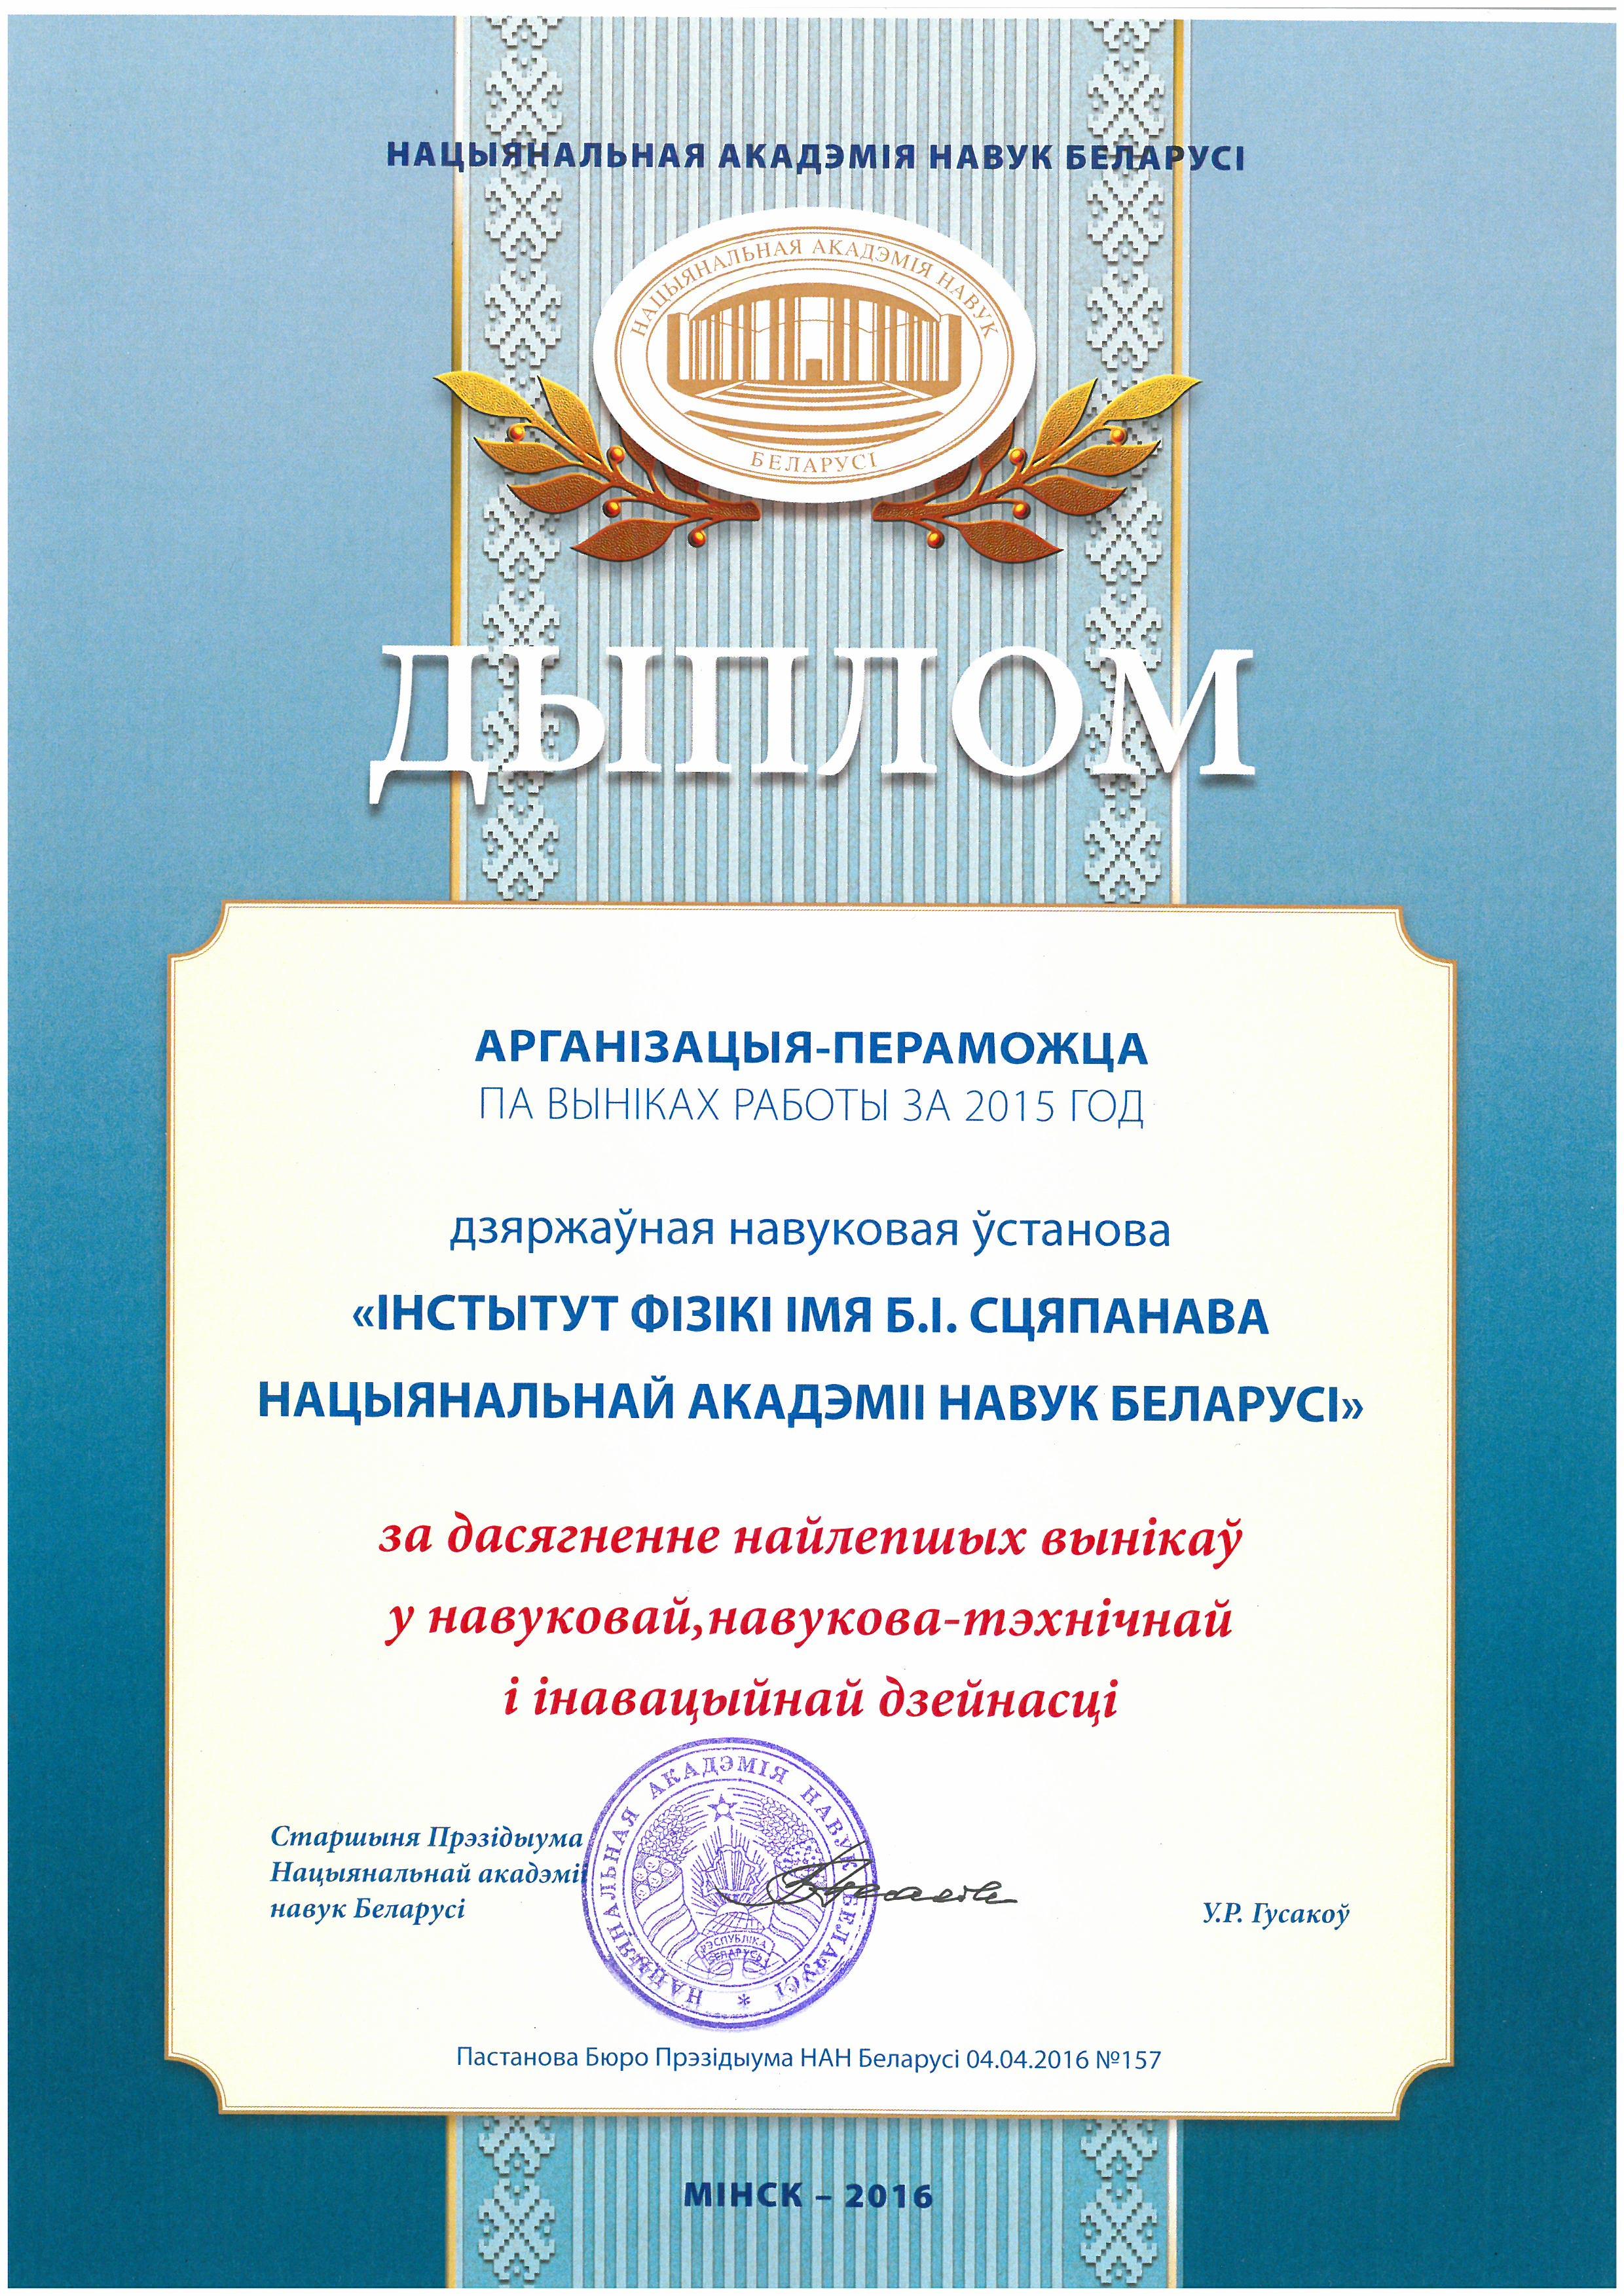 SKMBT_C224e16042915240_0001